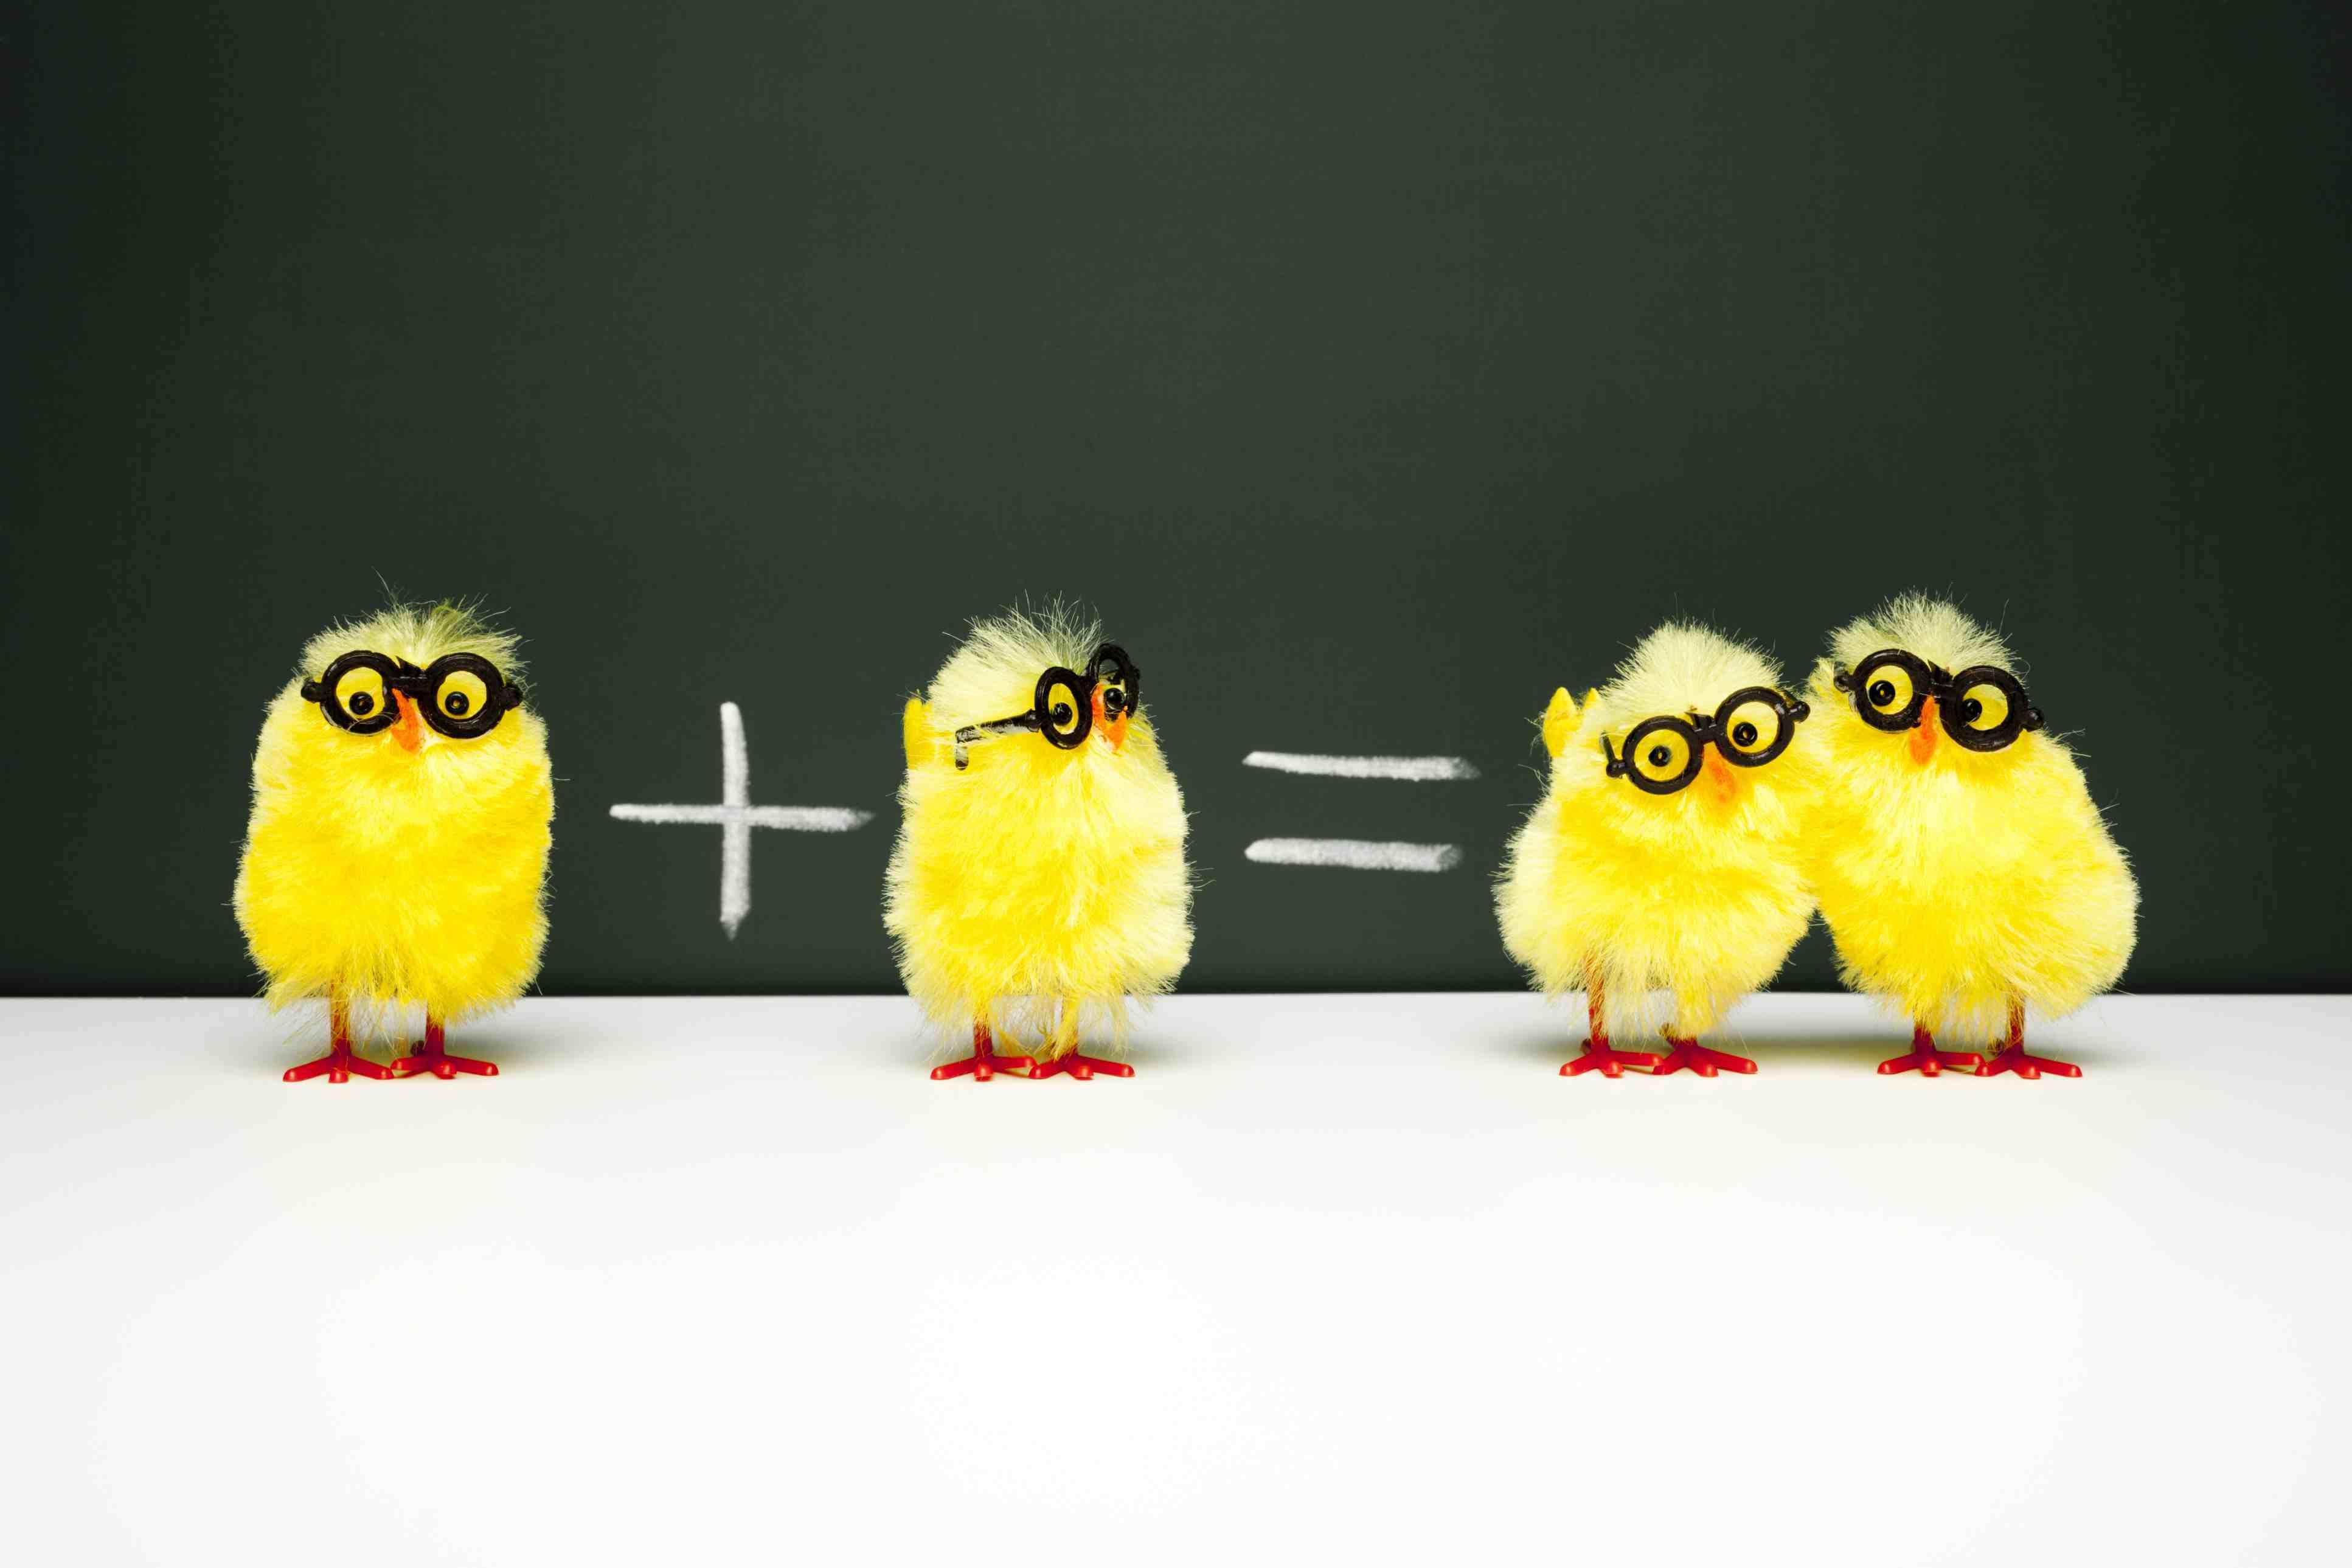 Baby chick math illustration